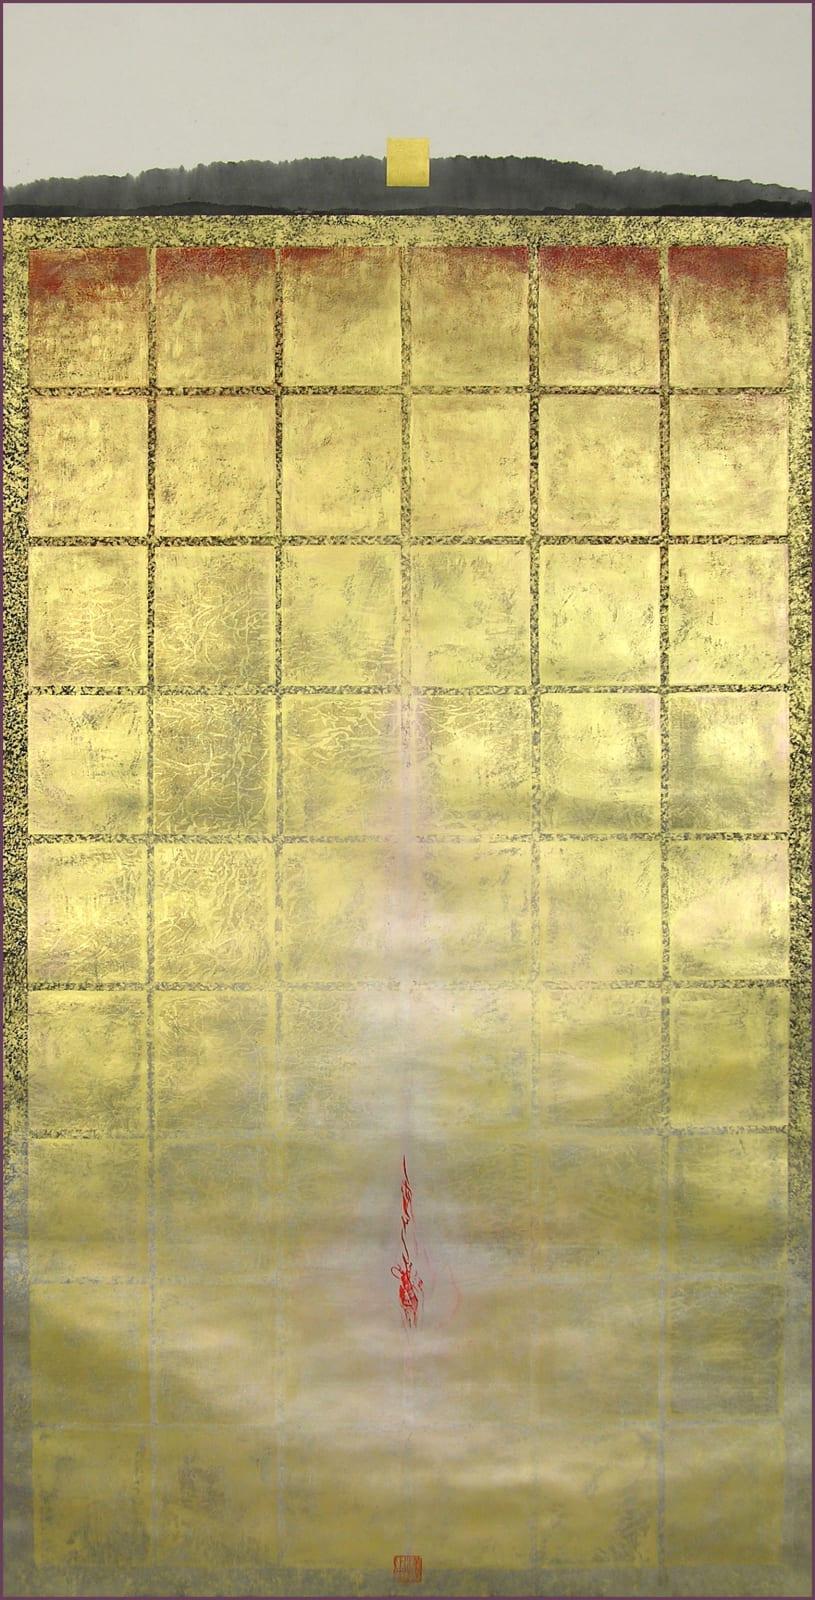 Kwok Hon Sum 郭漢深, Untitled 無題, 1992